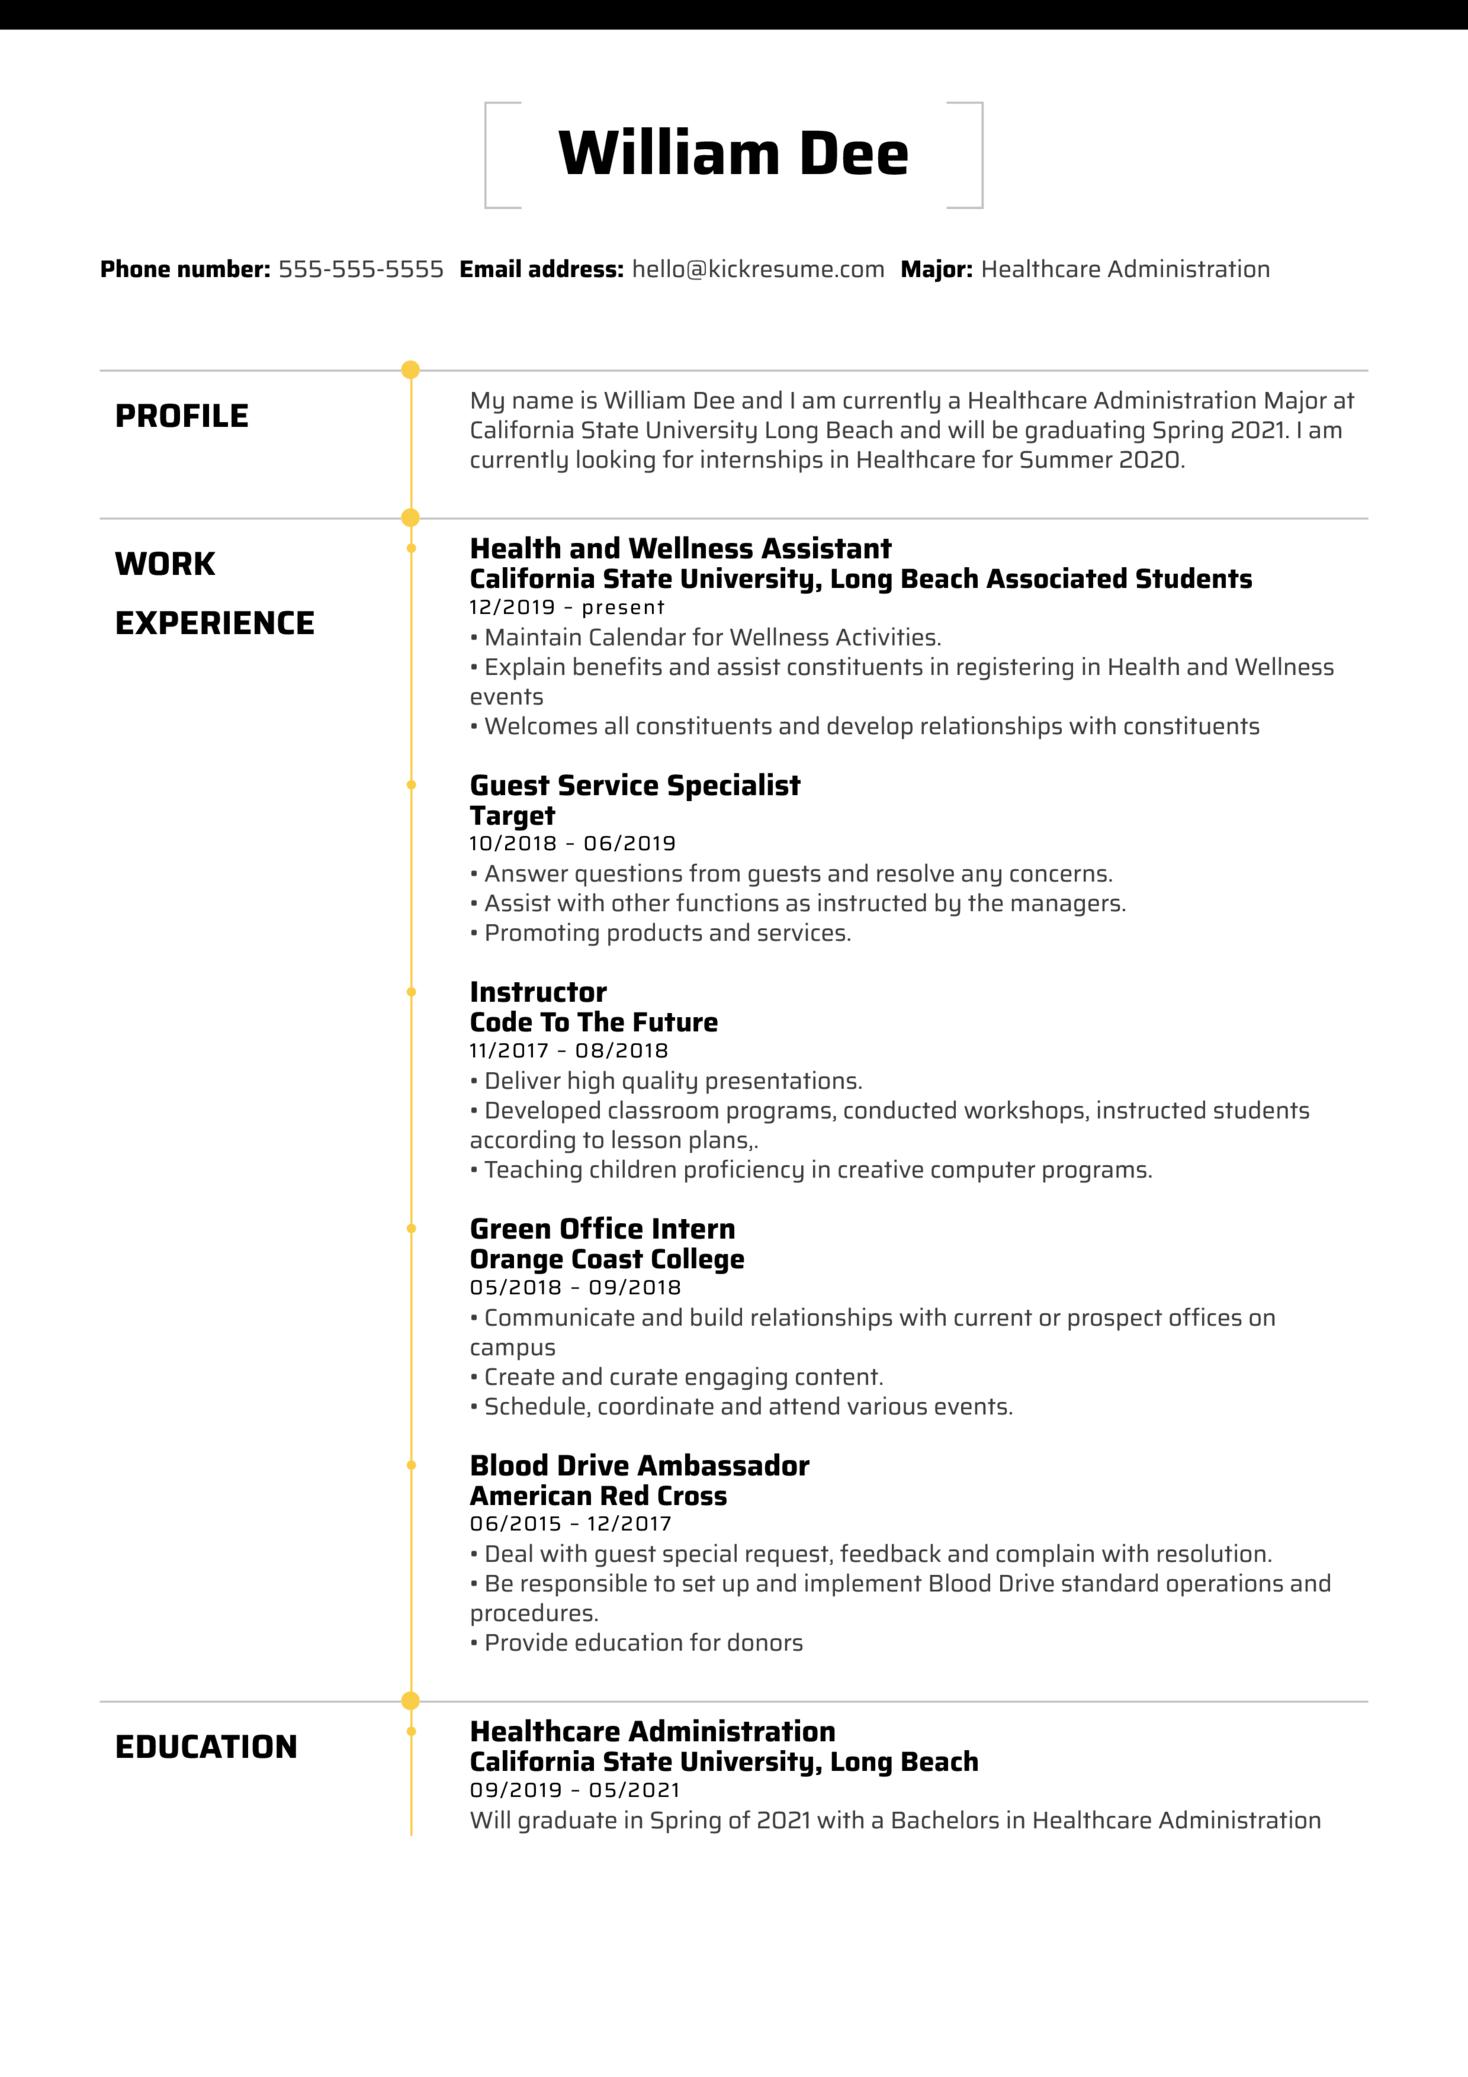 Beach Balance Assistant at UC Long Beach Resume Sample (parte 1)